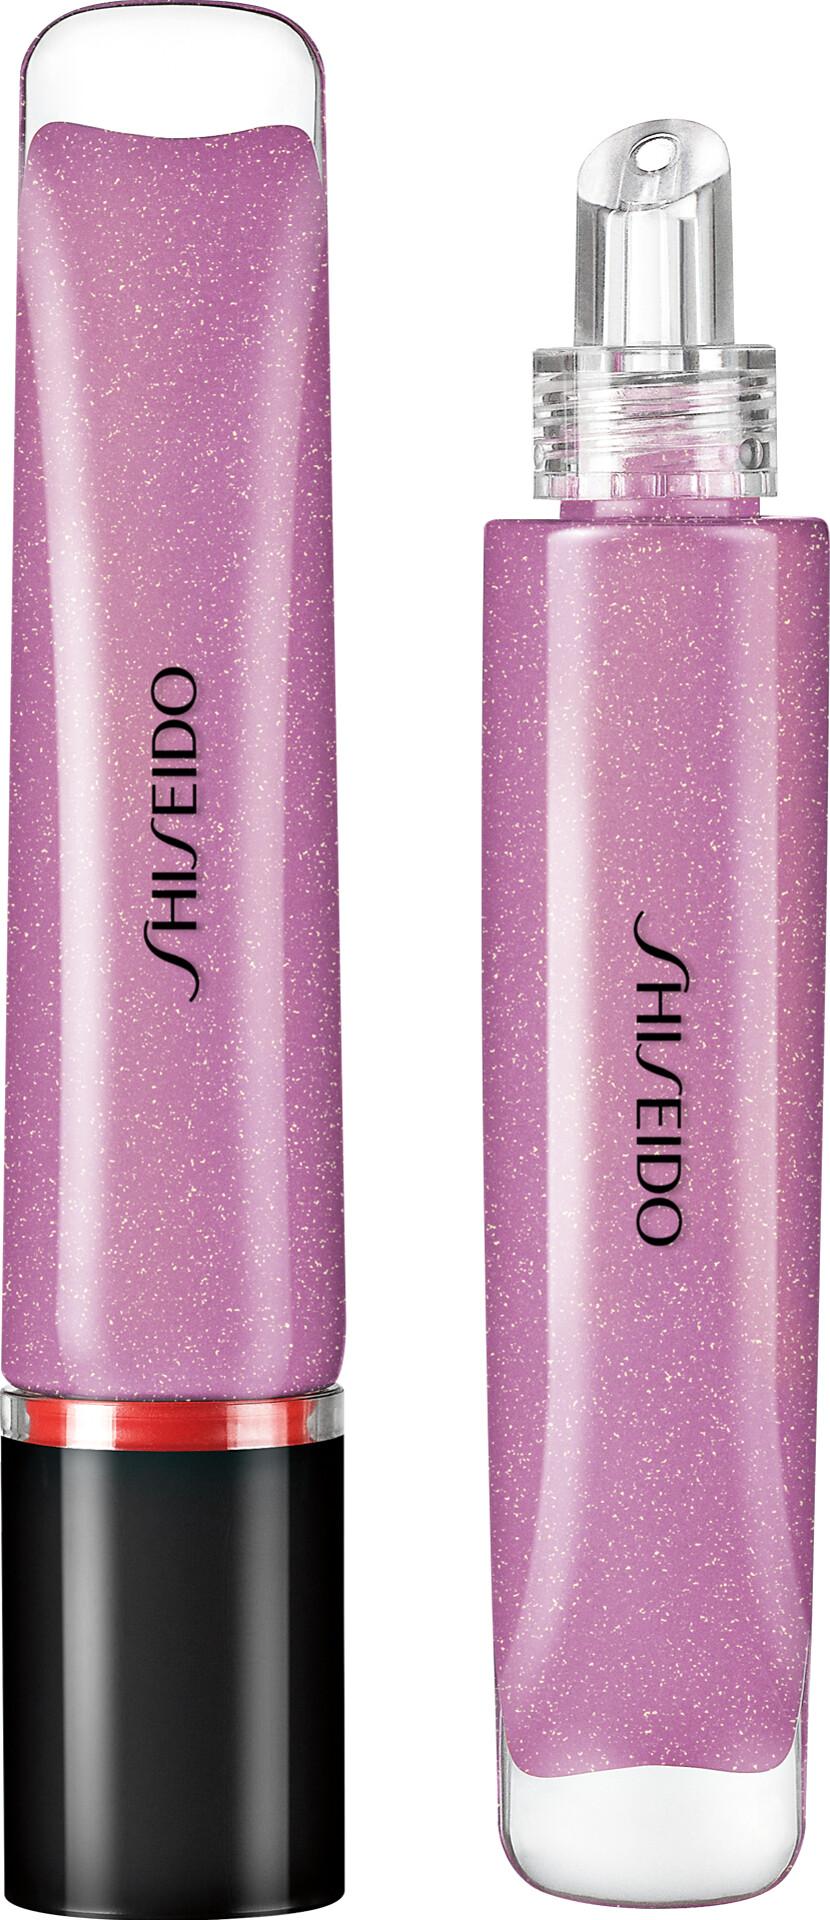 Shiseido Shimmer GelGloss 9ml 09 - Suisho Lilac